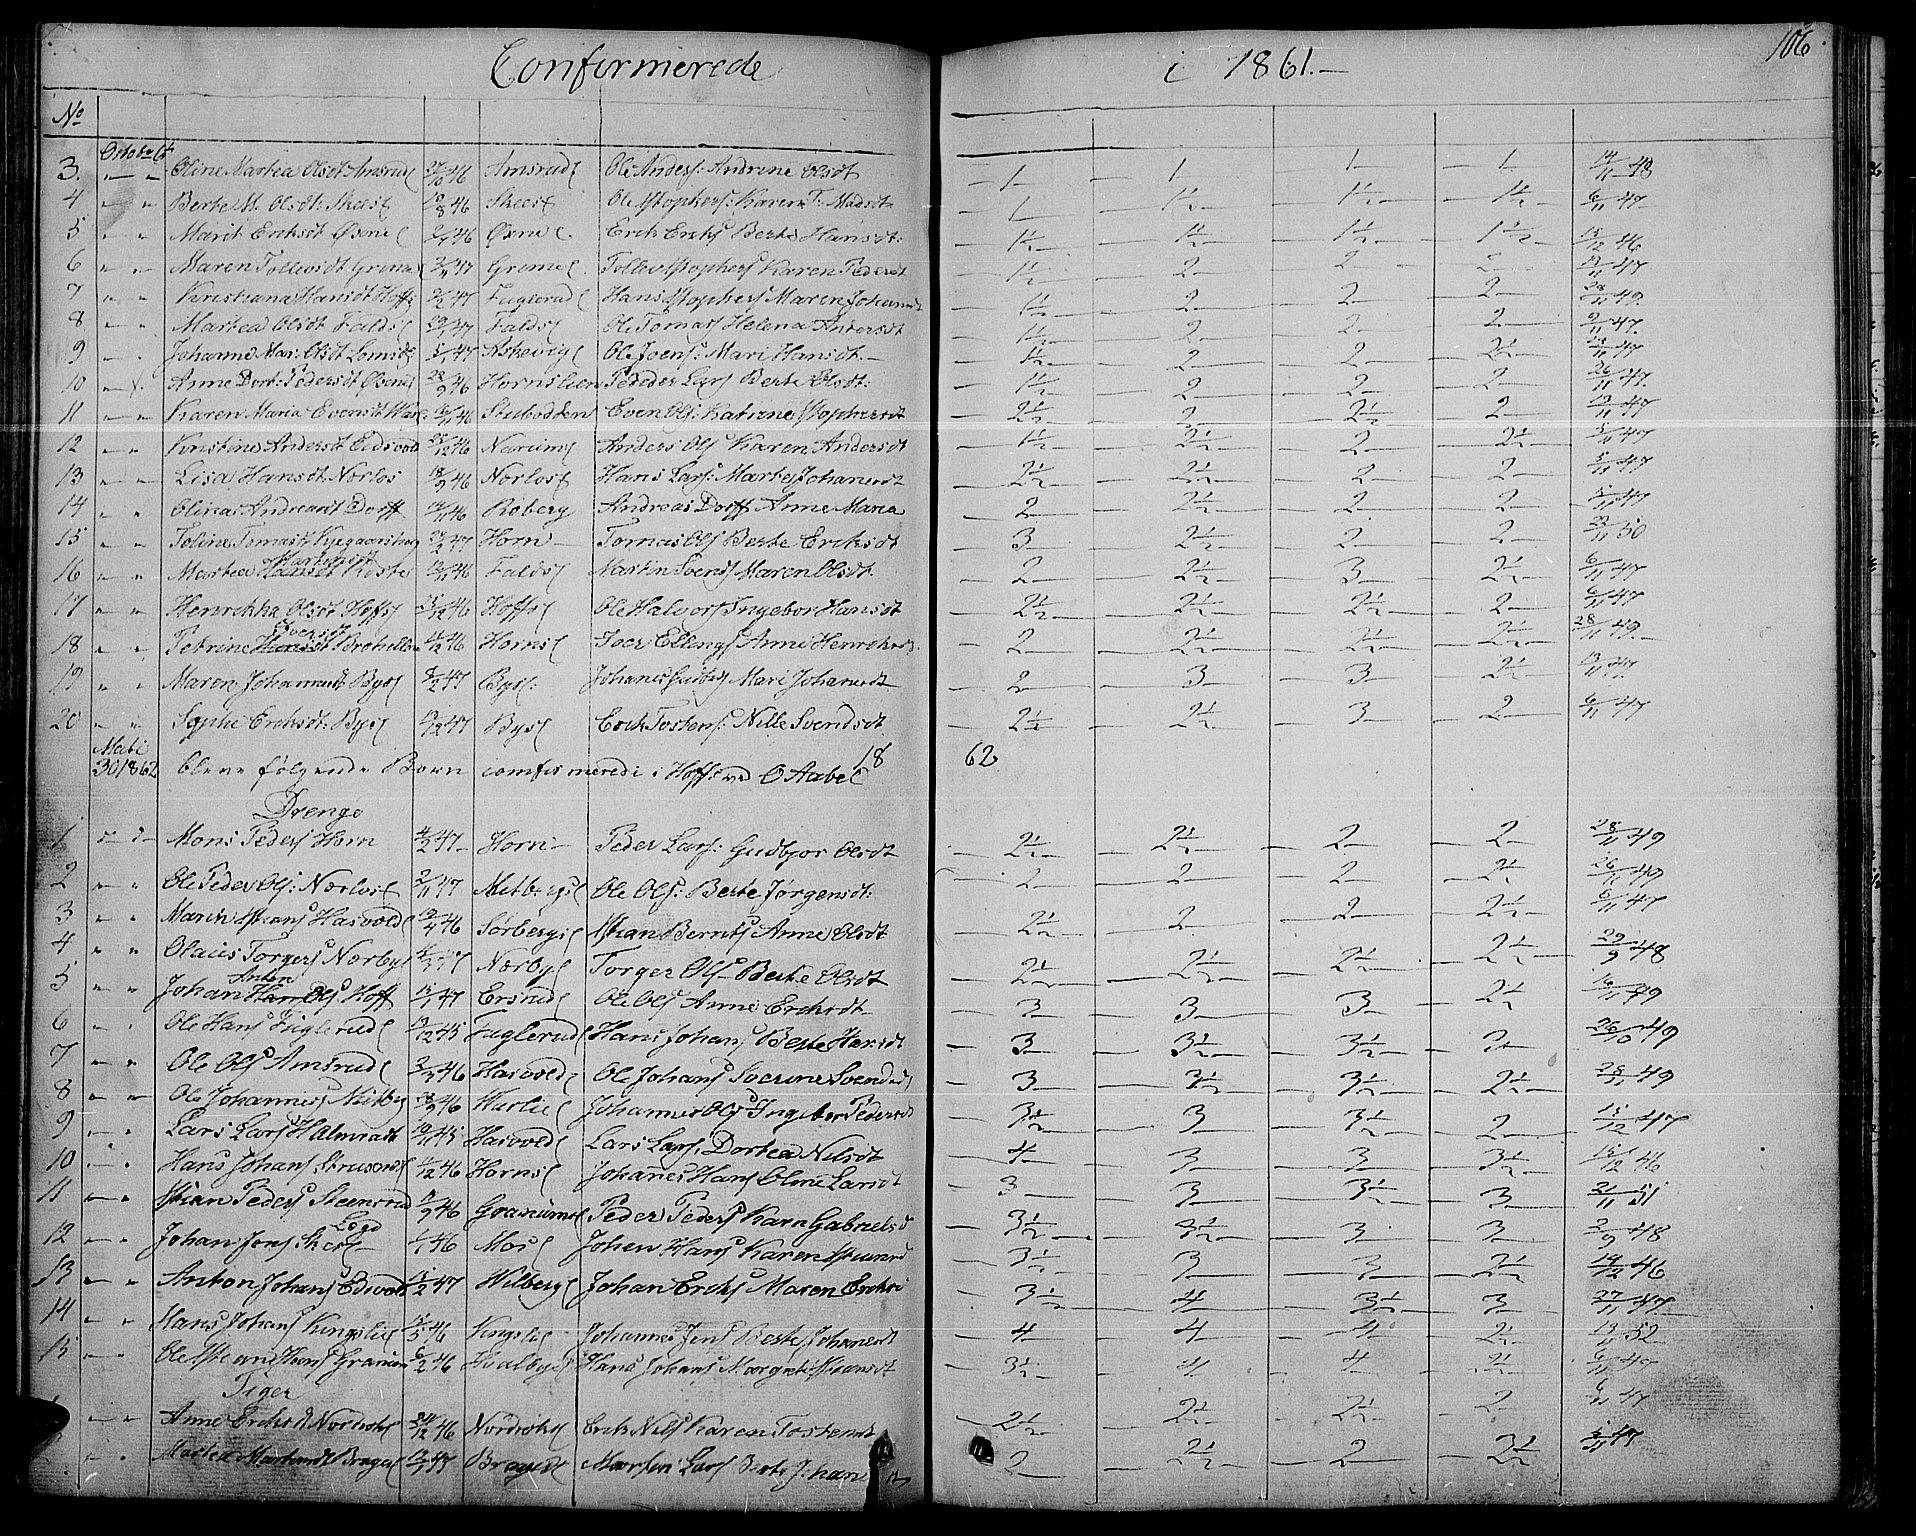 SAH, Søndre Land prestekontor, L/L0001: Klokkerbok nr. 1, 1849-1883, s. 106